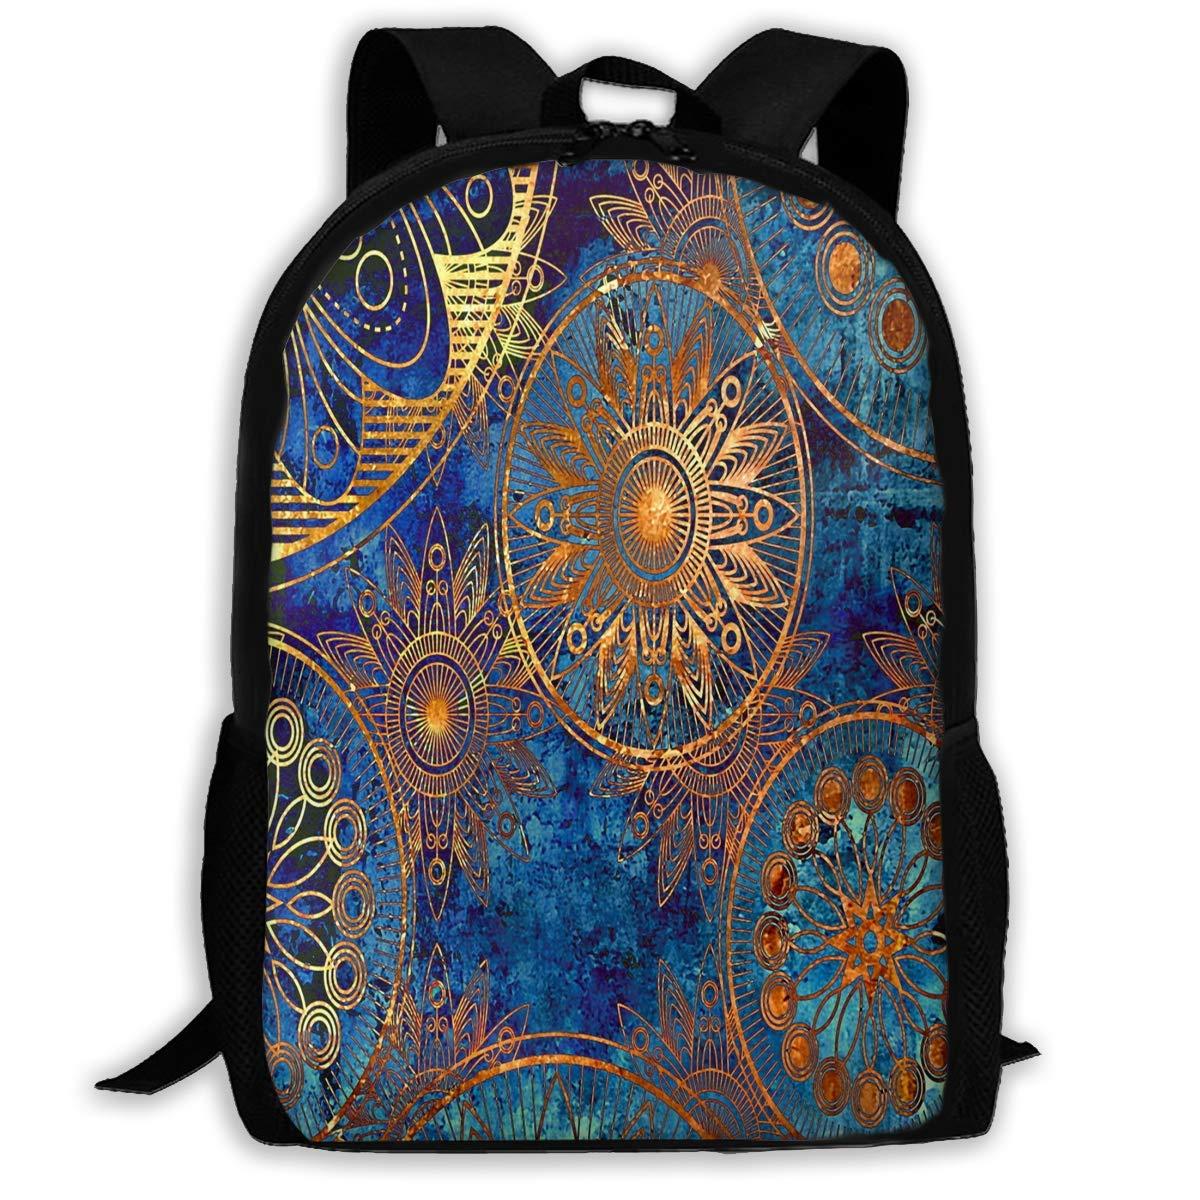 color08 One_Size Backpack for Adults Boho Whimsical Elephant Shoulders Bag